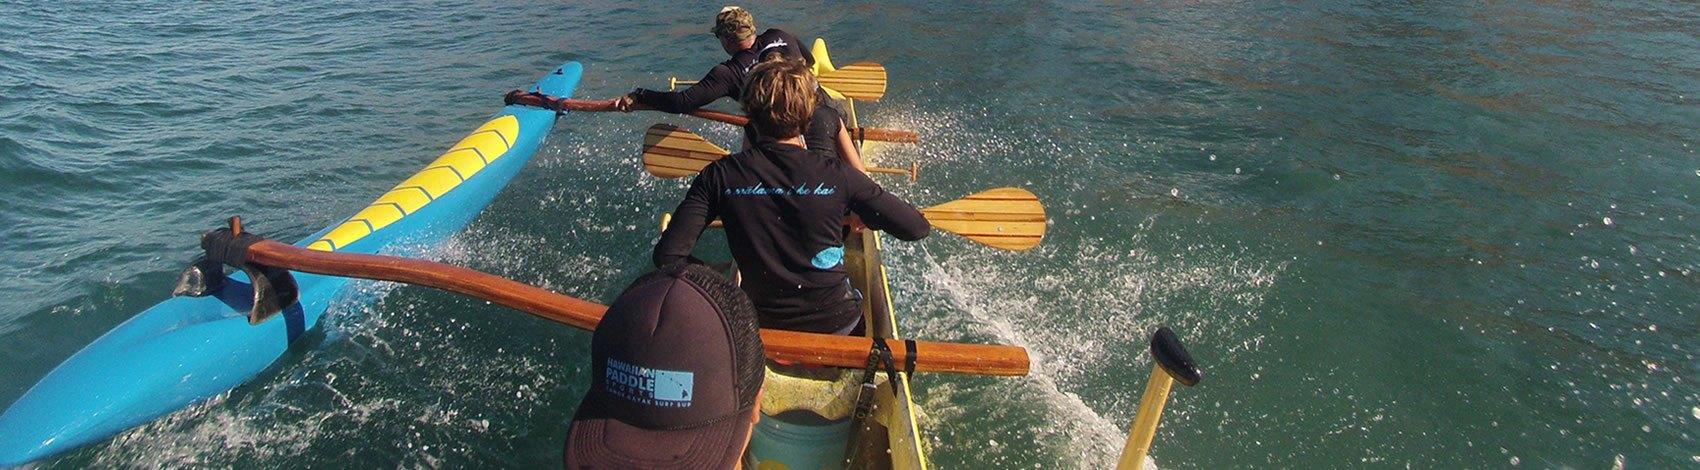 Canoe Surf Lesson Maui Hawaii